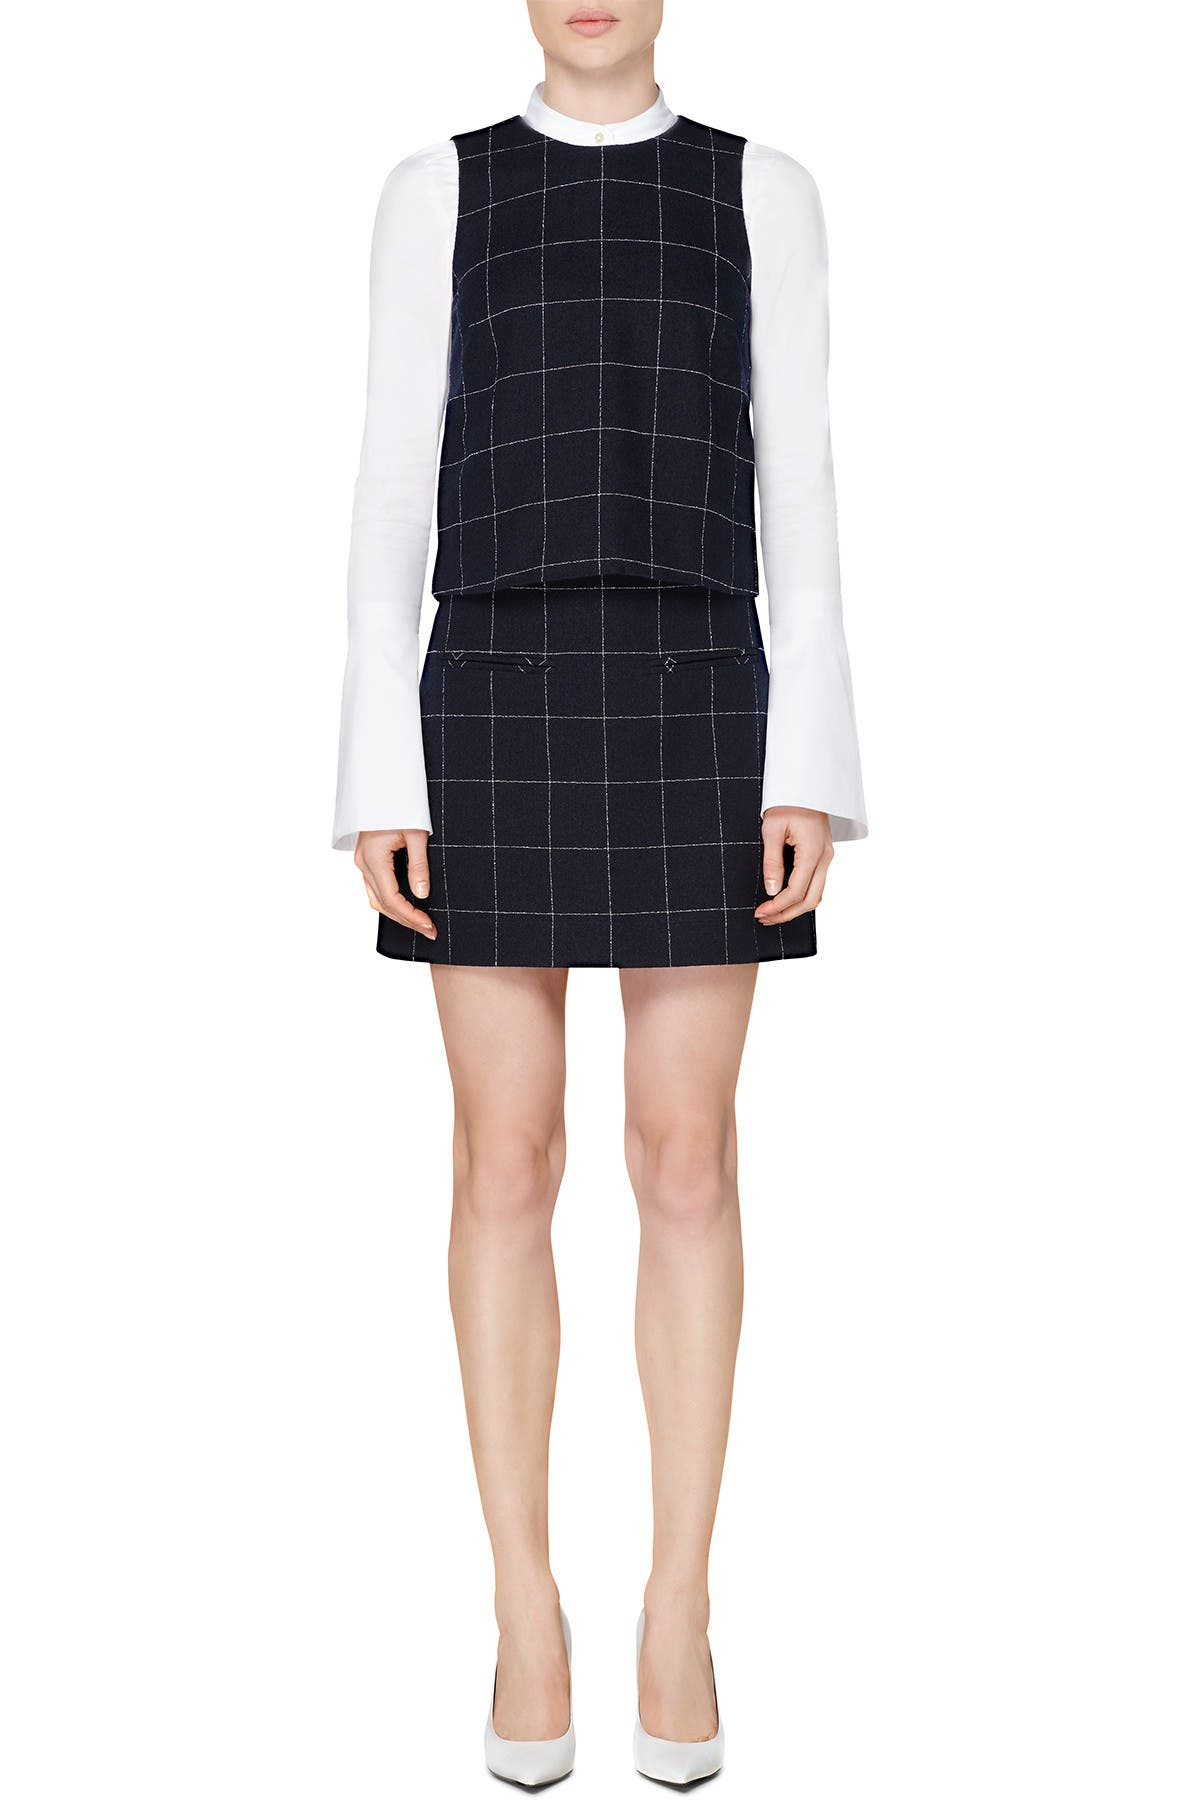 Image of SUISTUDIO Alfie Windowpane Print Mini Skirt